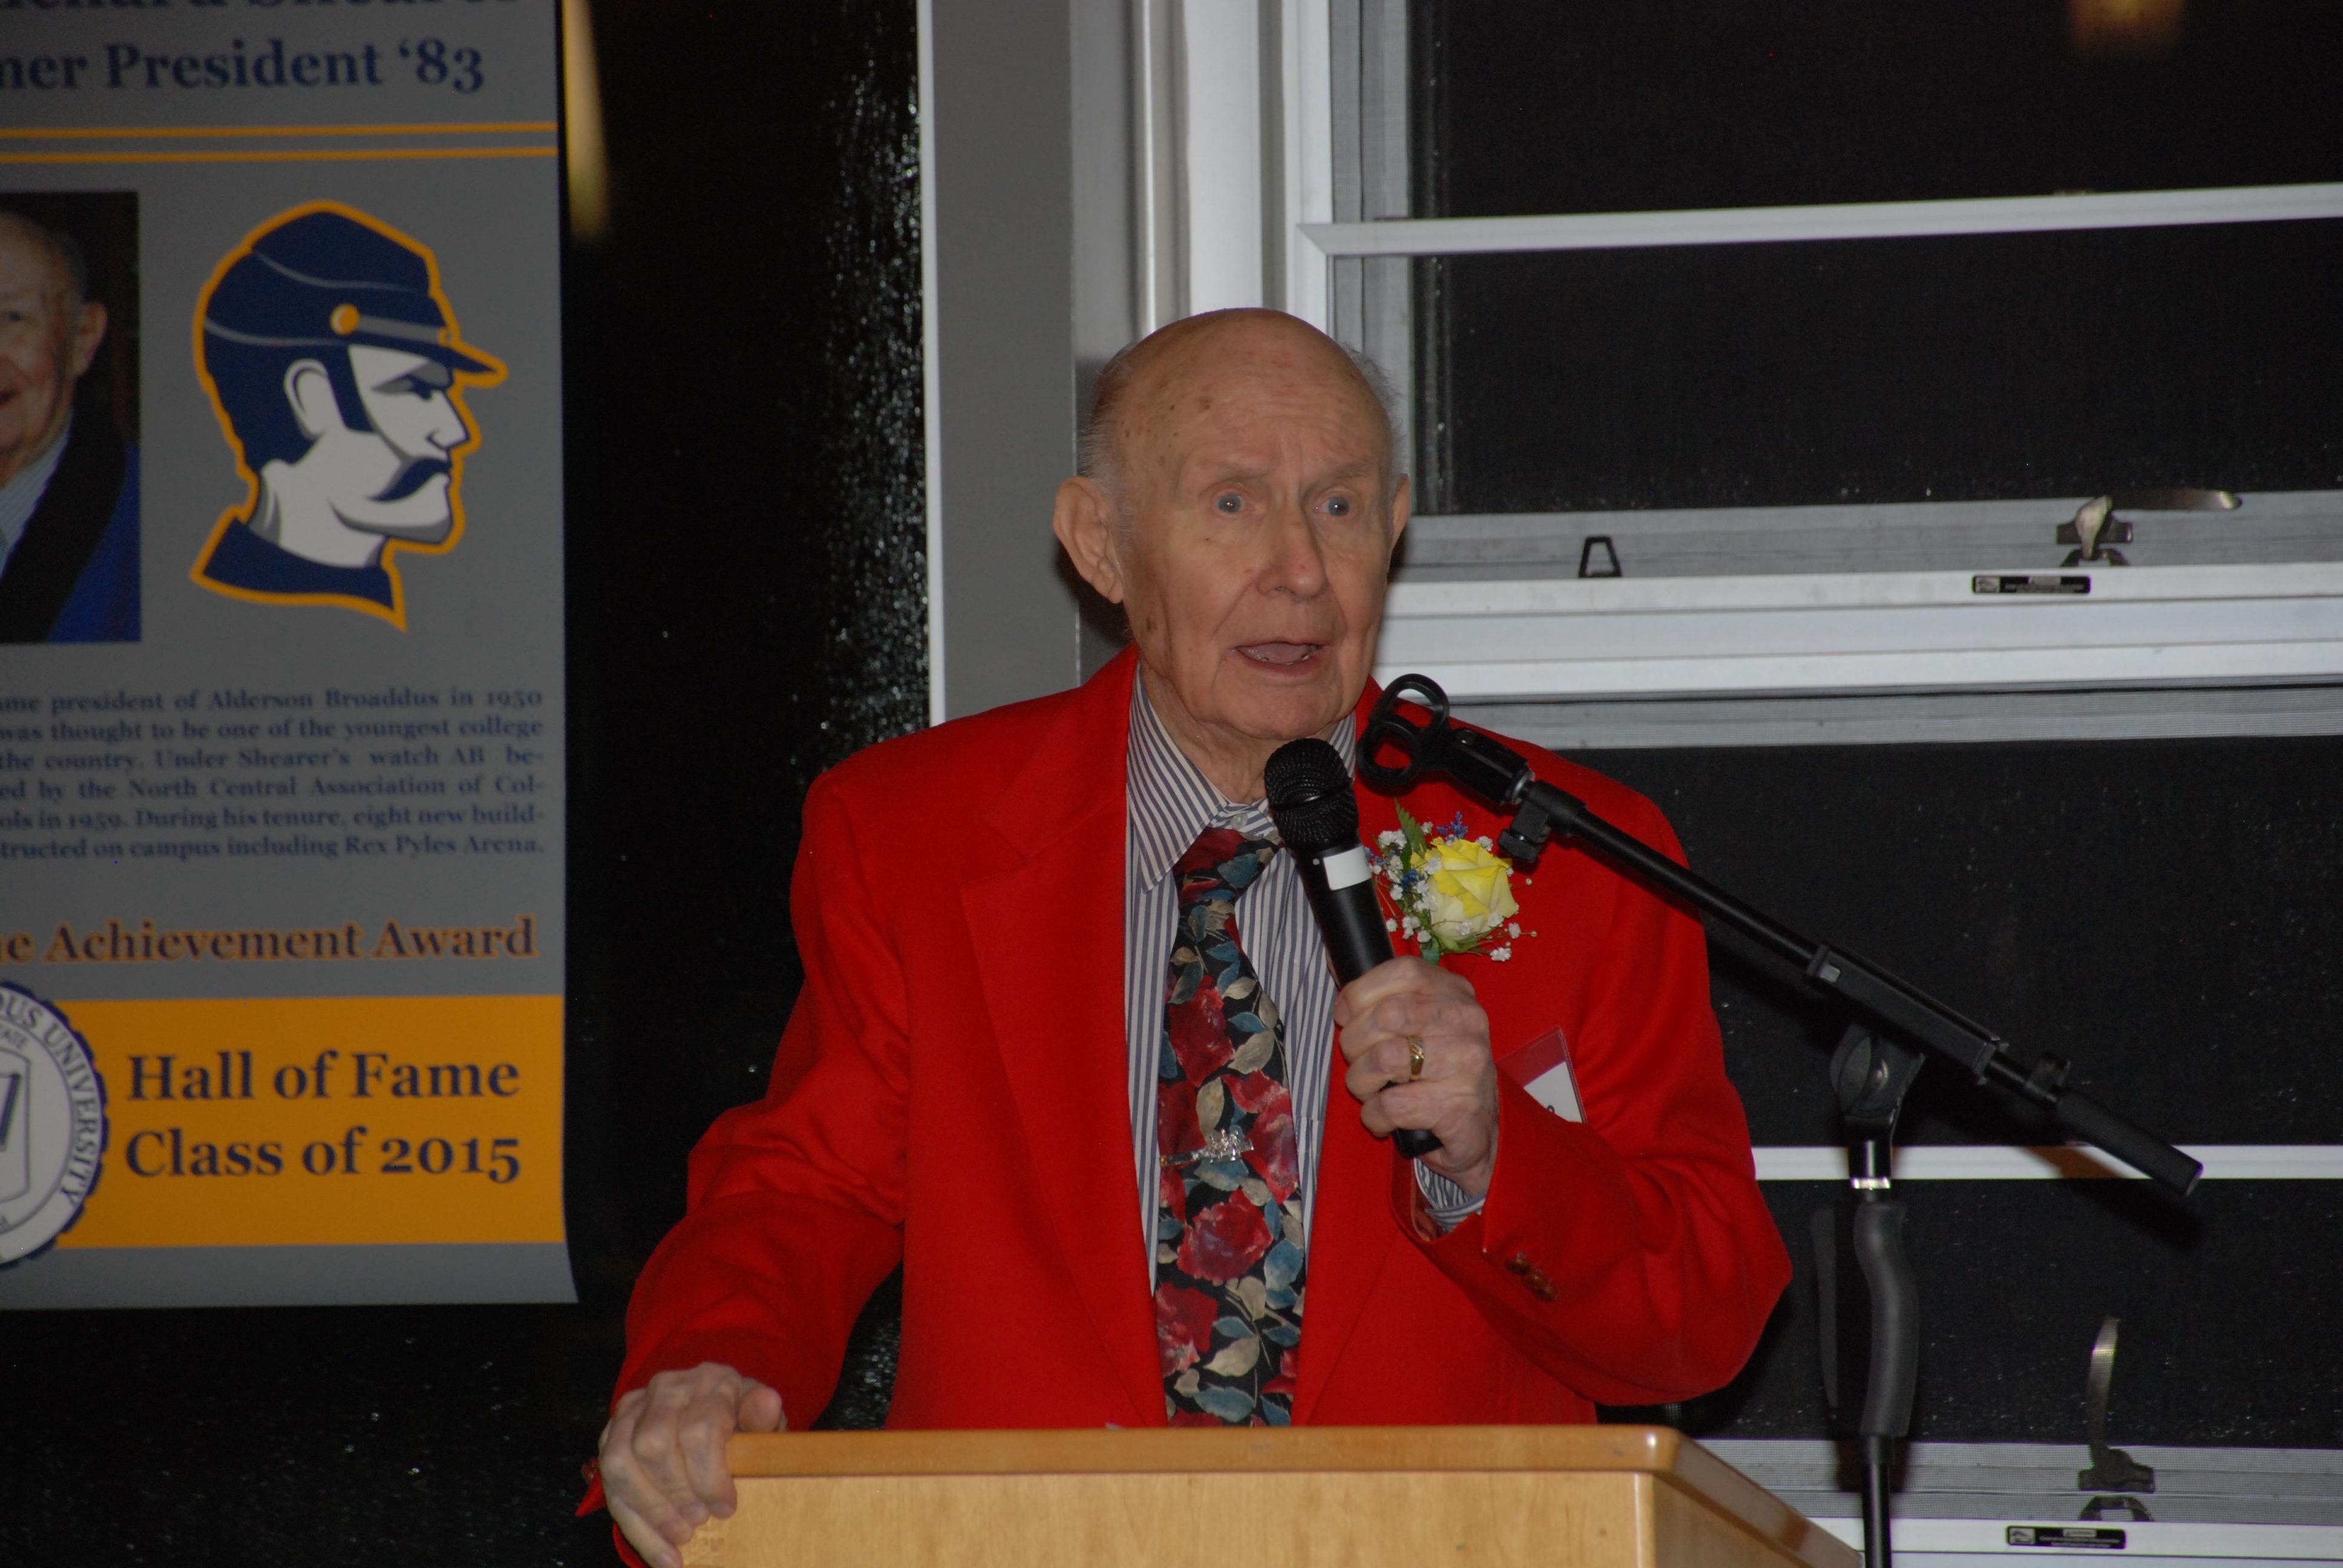 Dr. Richard Shearer - Hall Of Fame